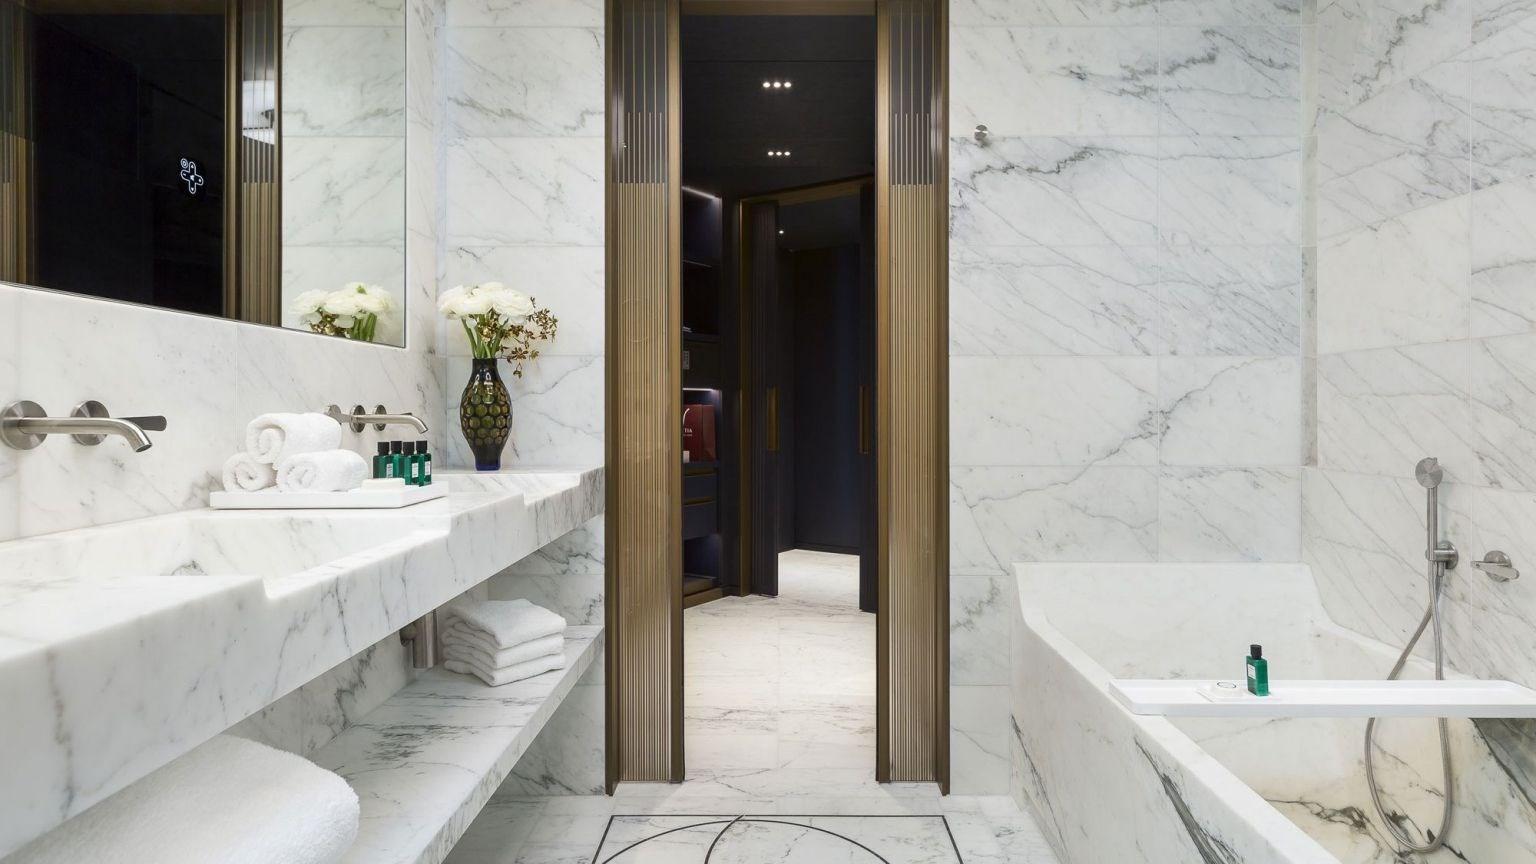 Les salles de bains de l'hôtel Lutetia : toutes de marbre blanc vêtues